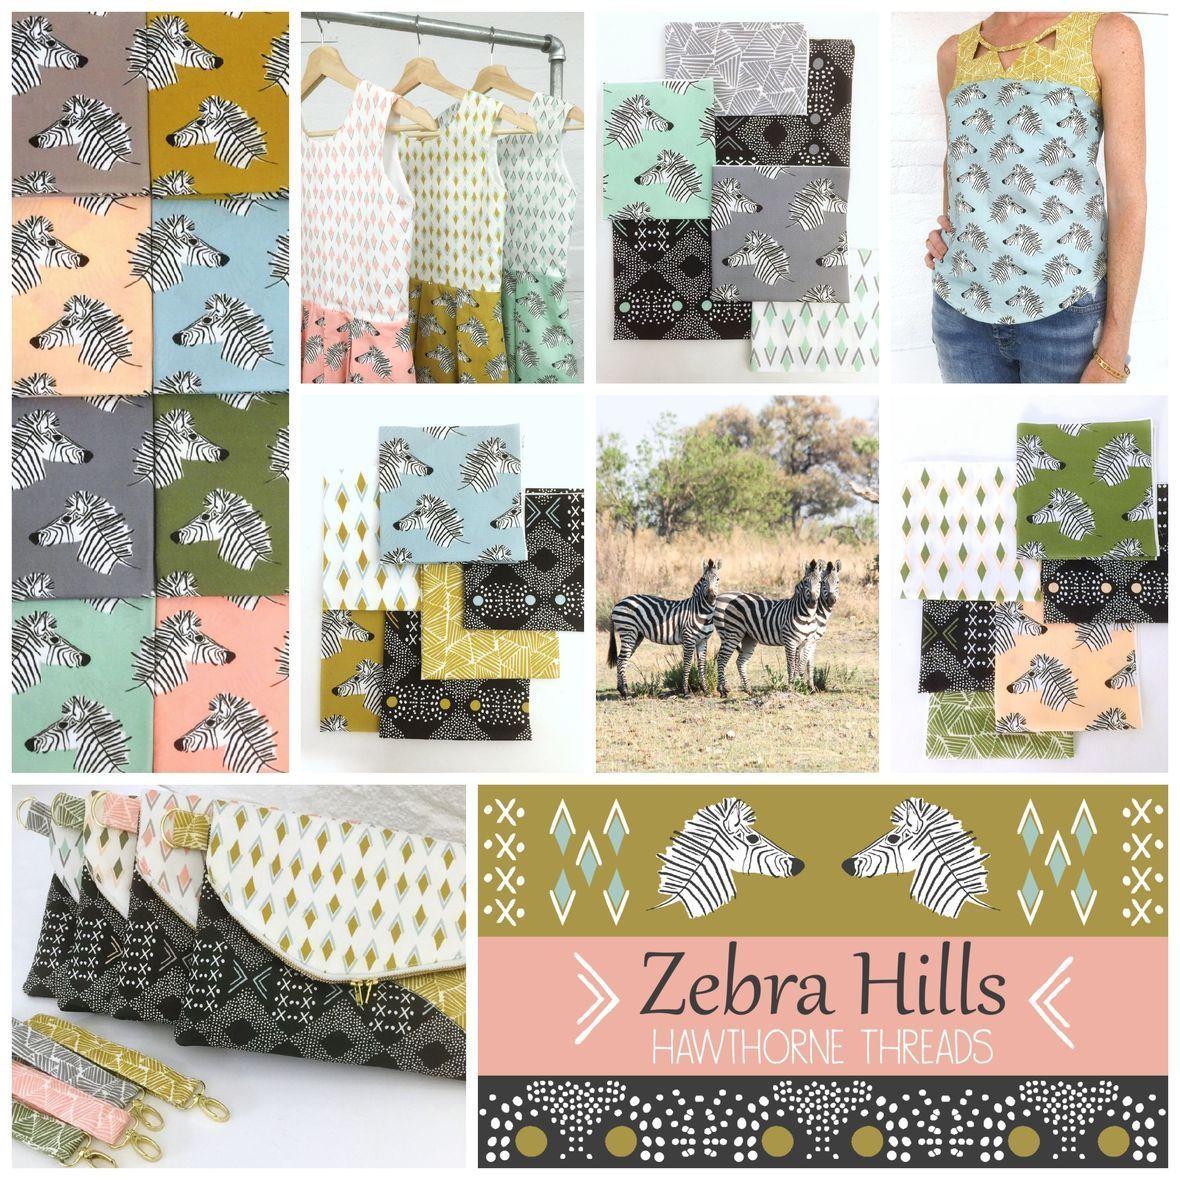 Zebra Hills Fabric Poster 2800